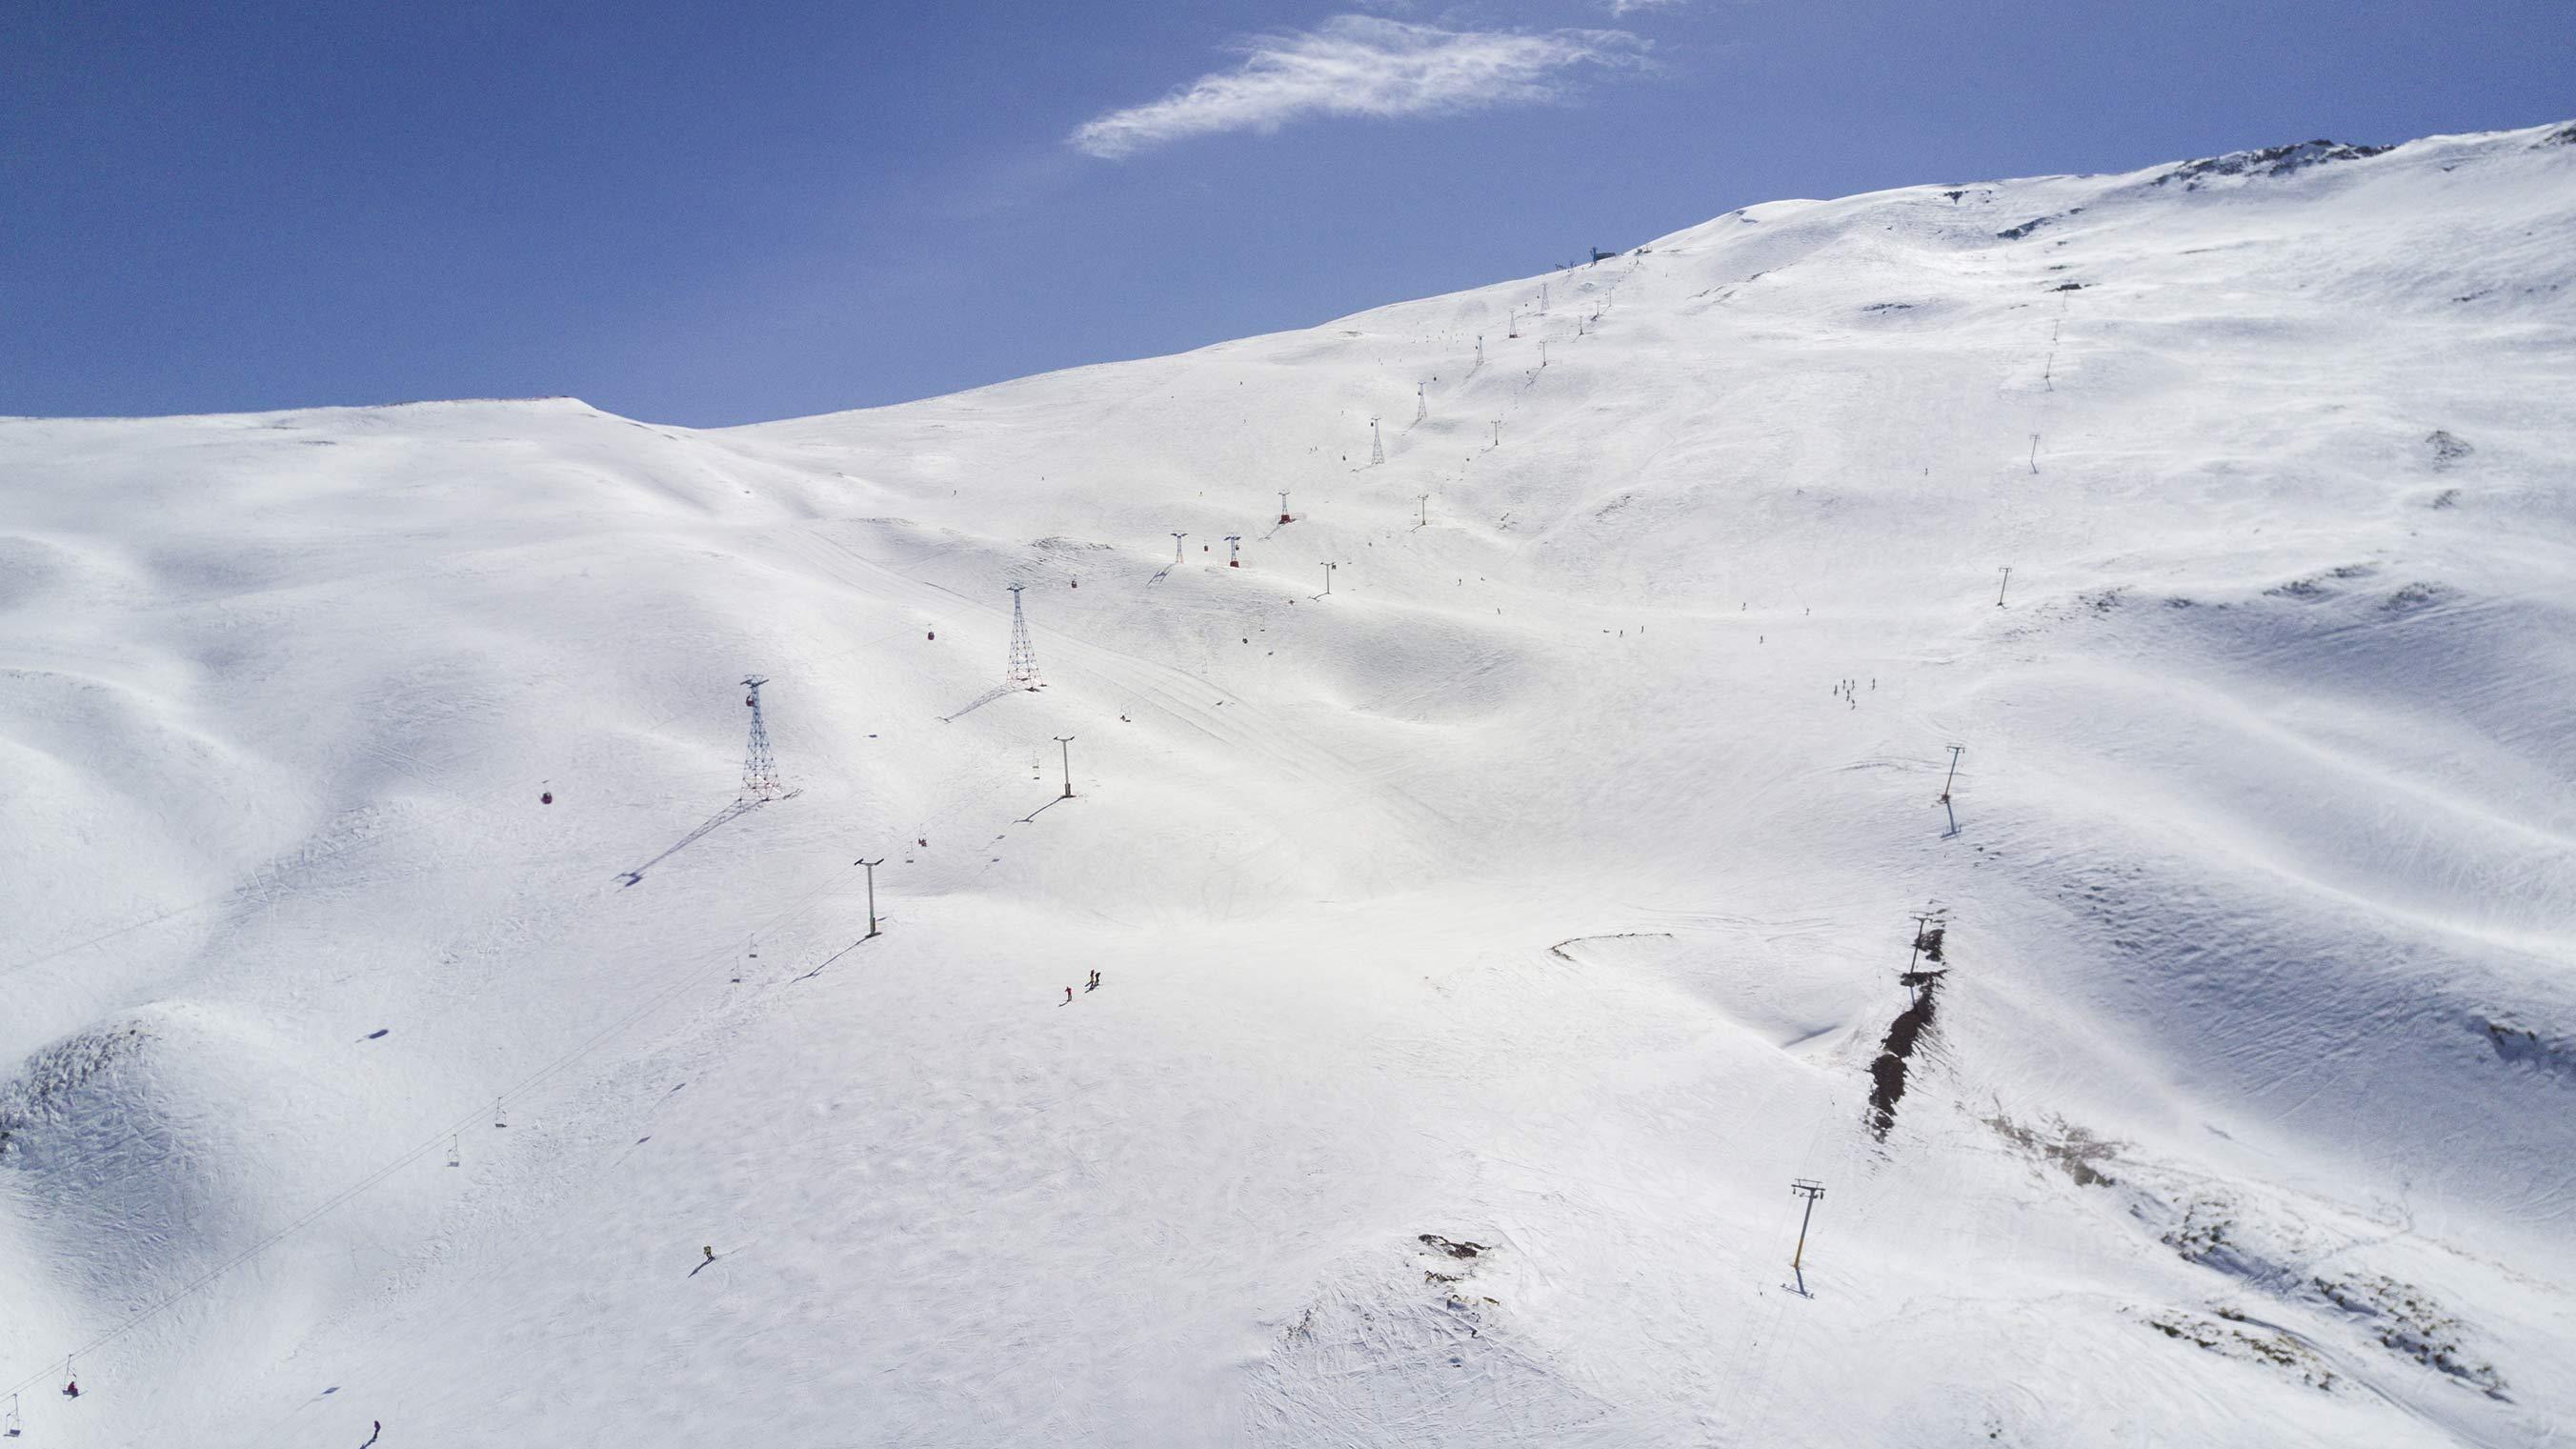 Iran ski tours dizin international resort